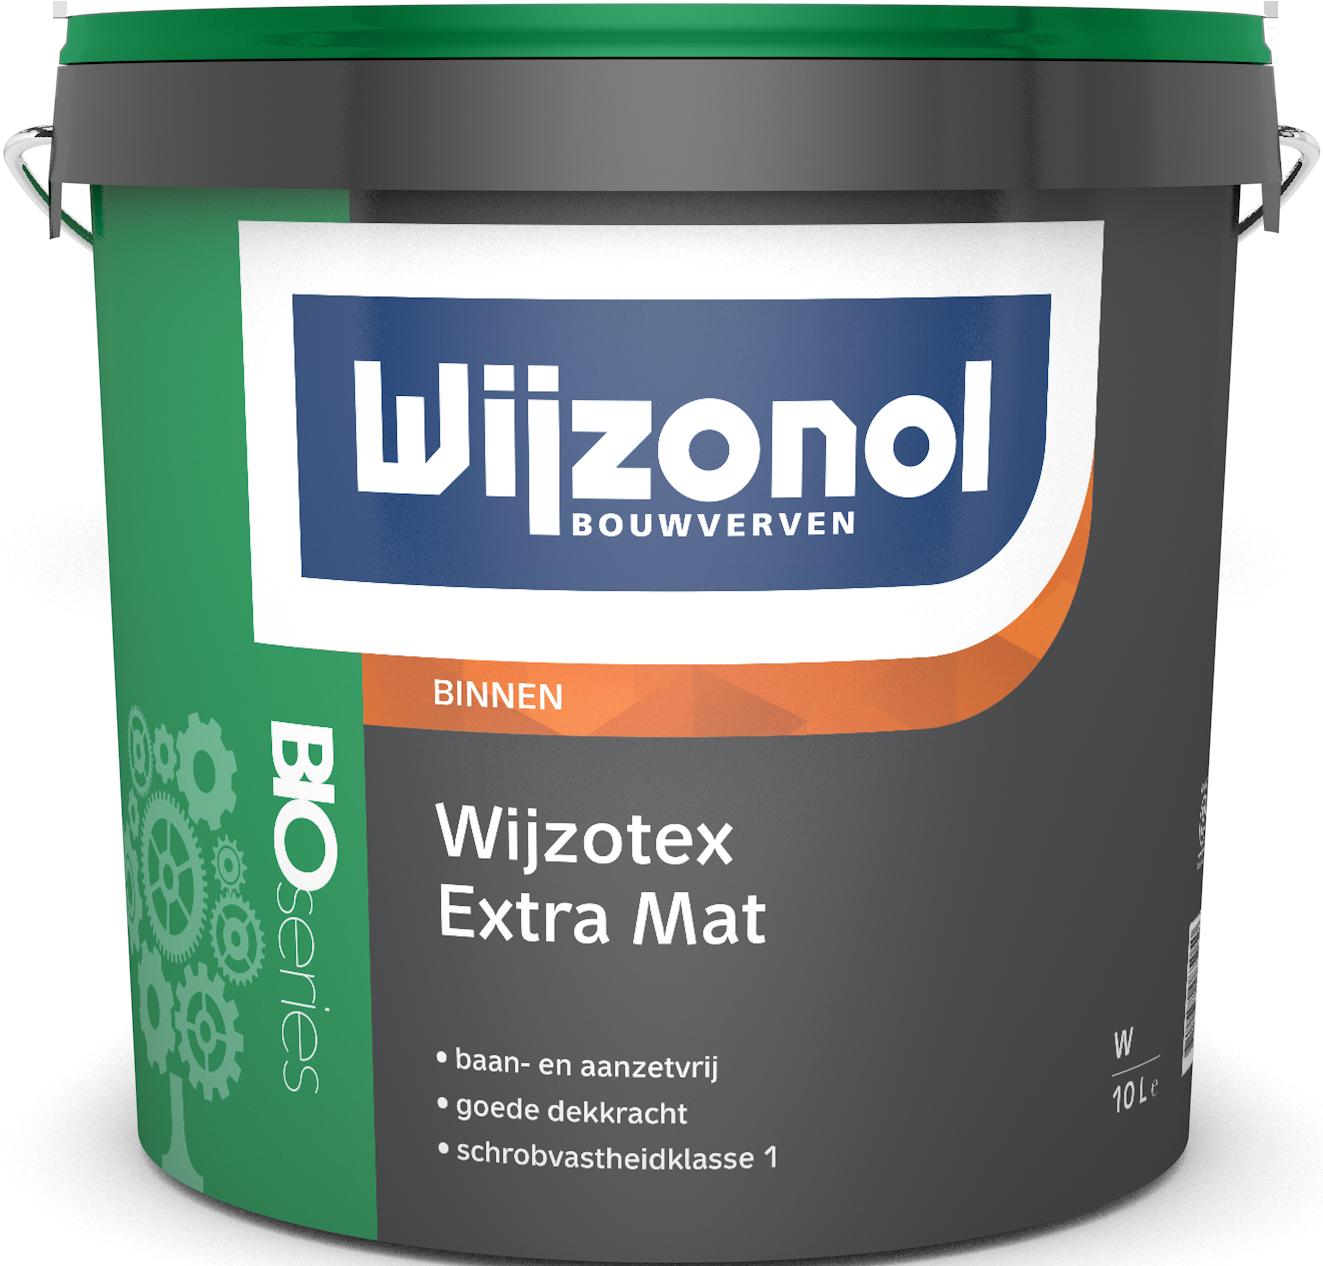 Wijzotex Extra Mat Bioseries 10 Liter 100% Wit